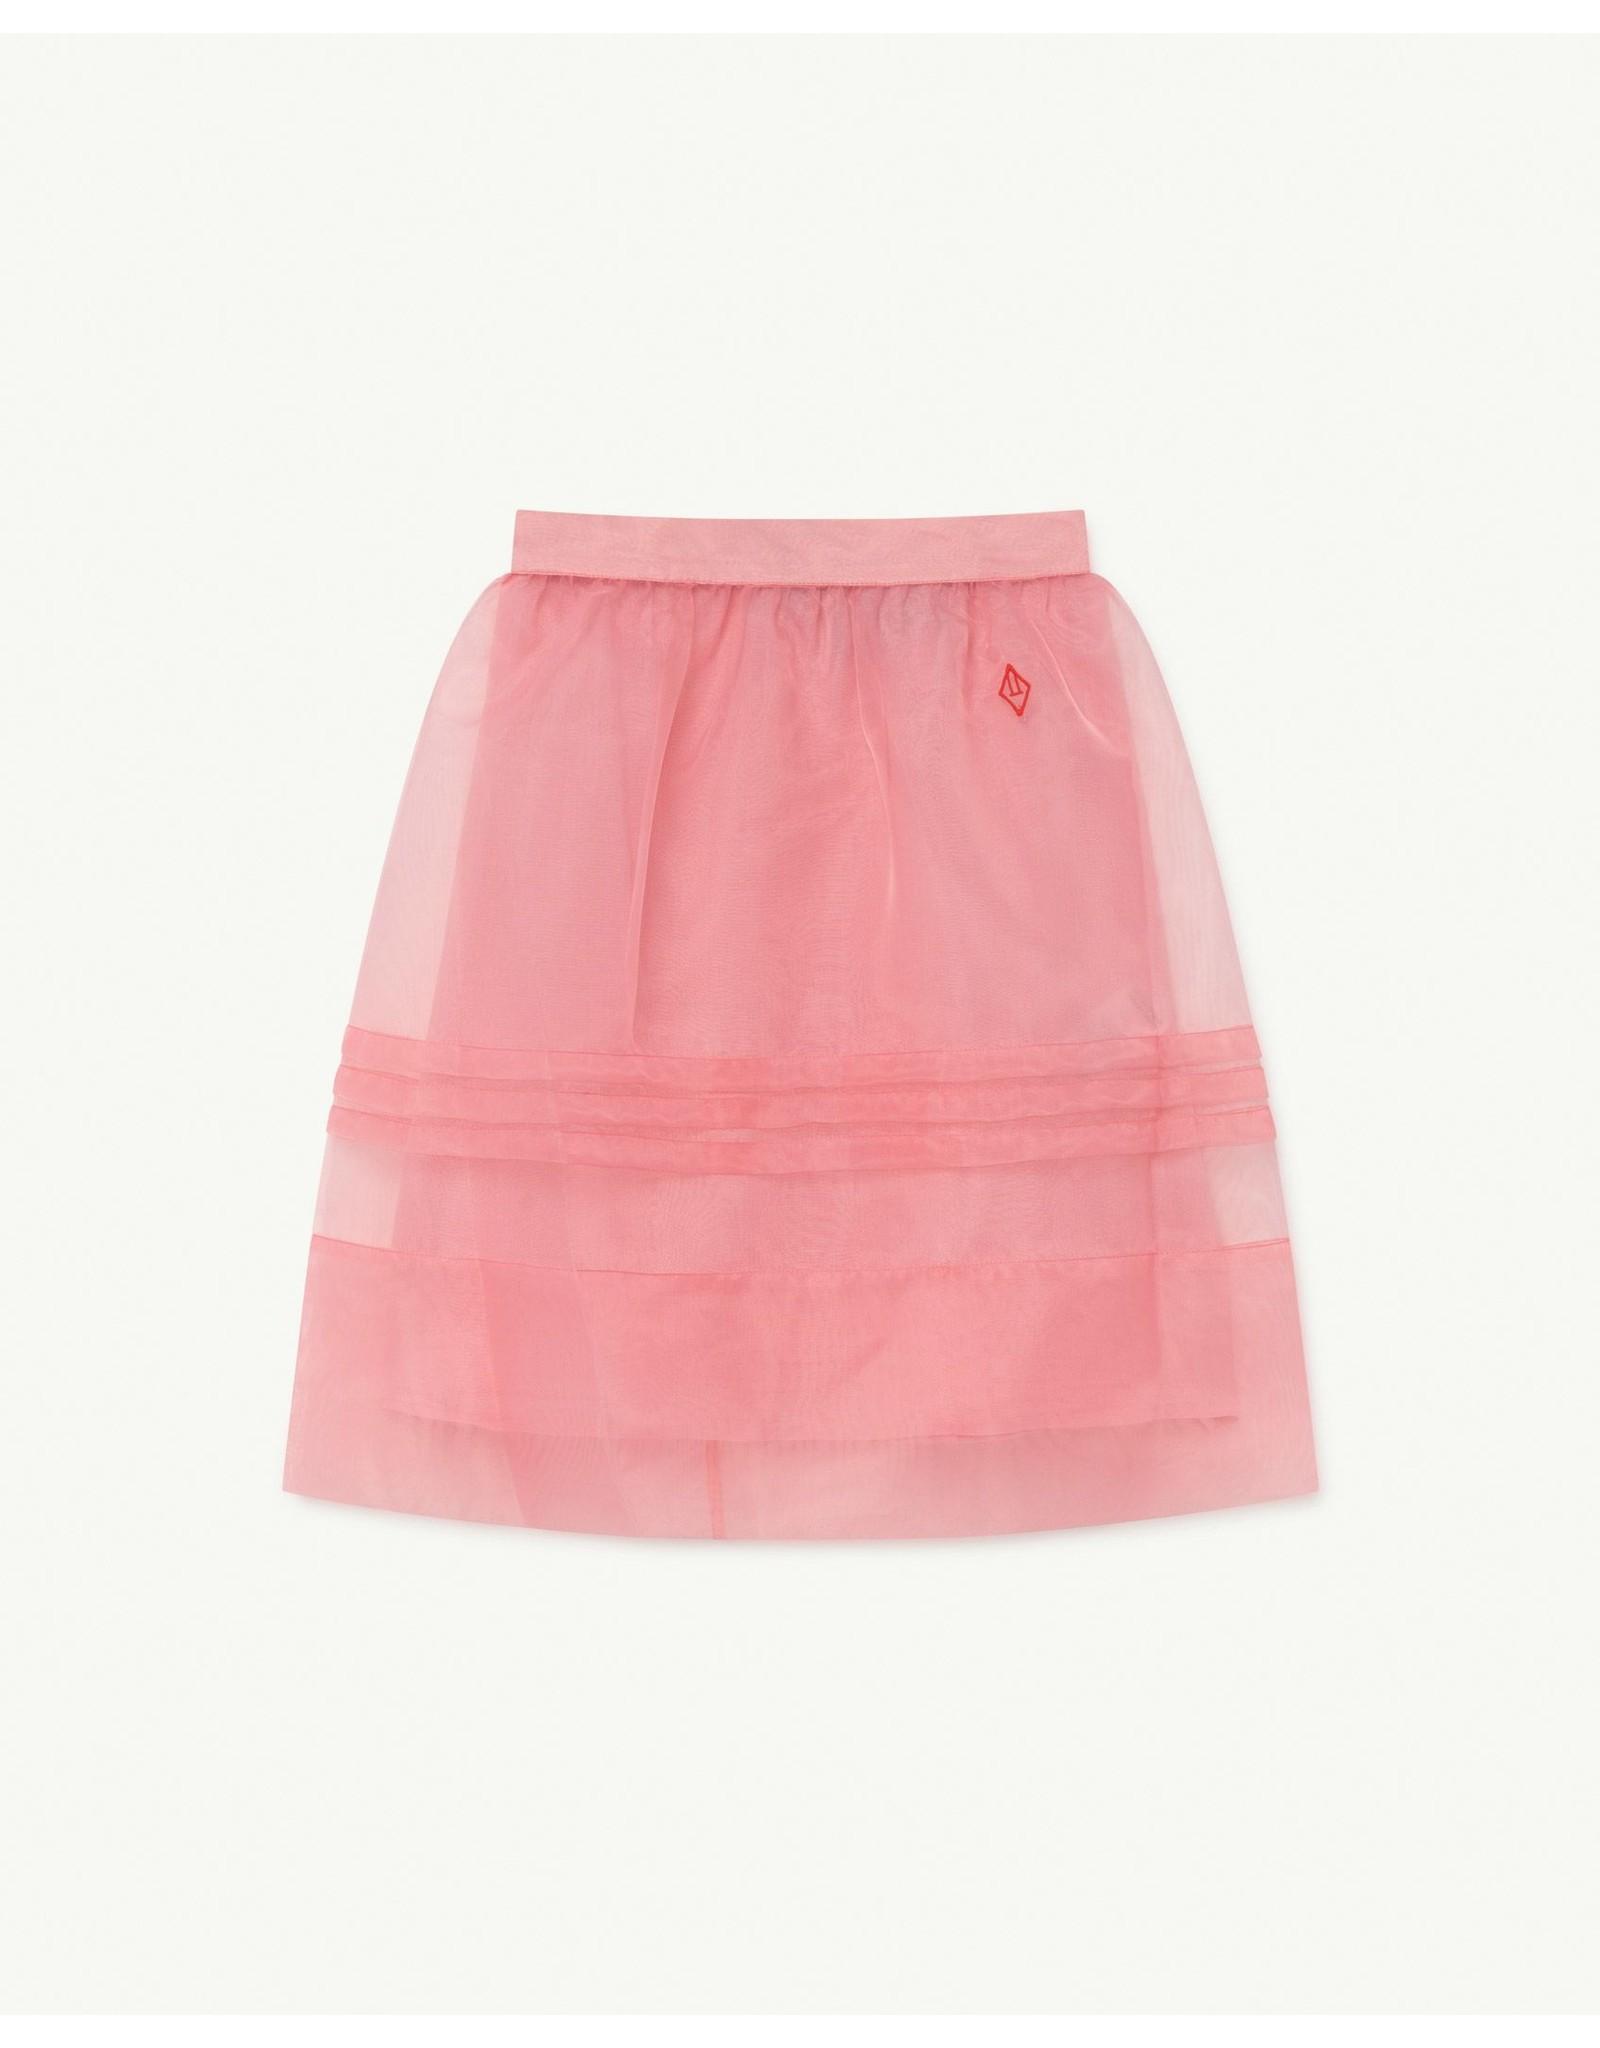 TAO SS21169 Blowfish skirt soft pink